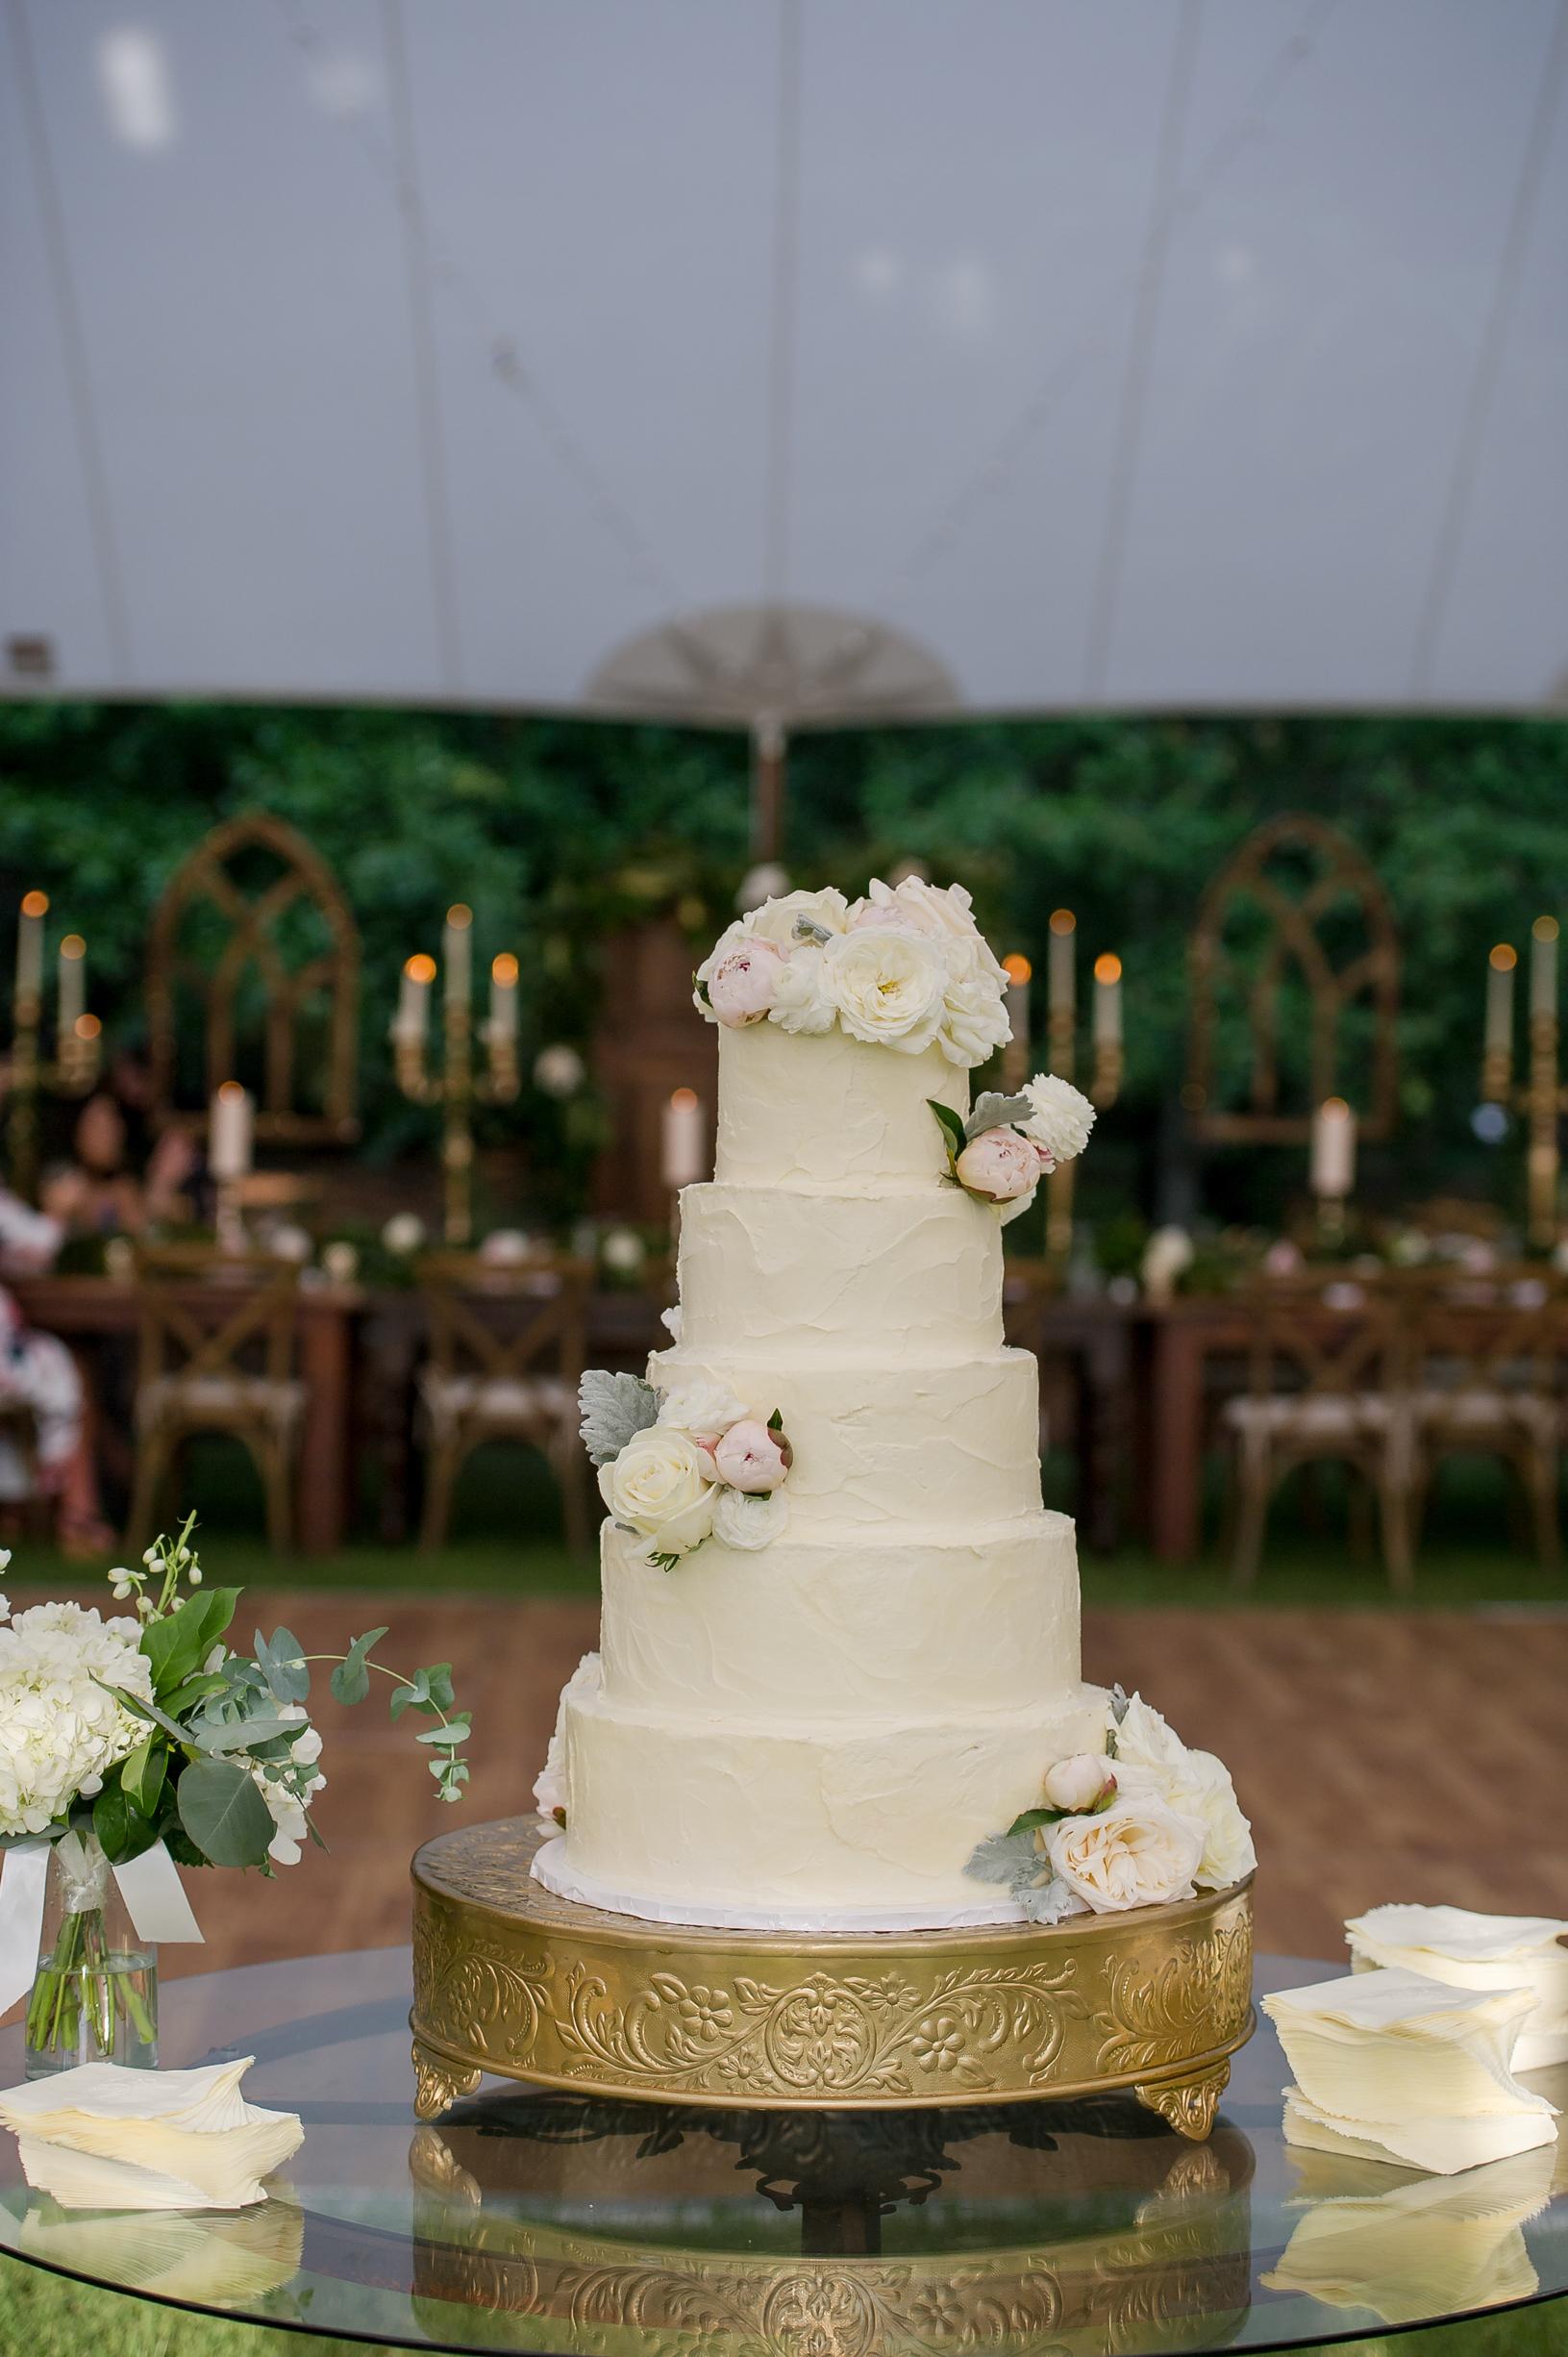 Royal Wedding with Outdoor Reception-46.JPG